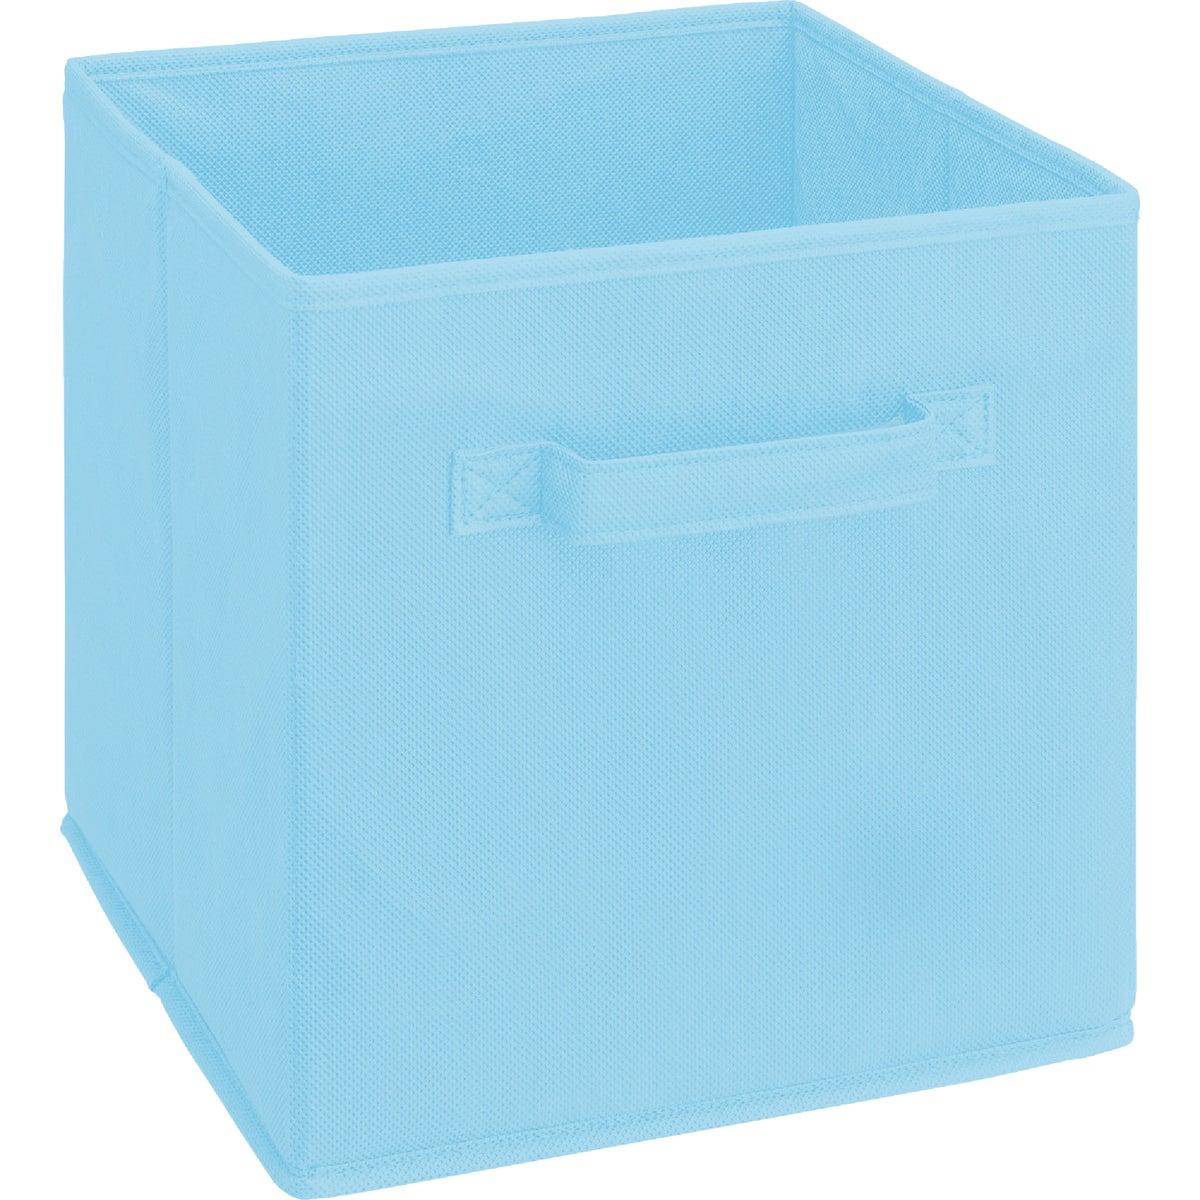 ClosetMaid Cubeicals Fabric Drawer, 87900